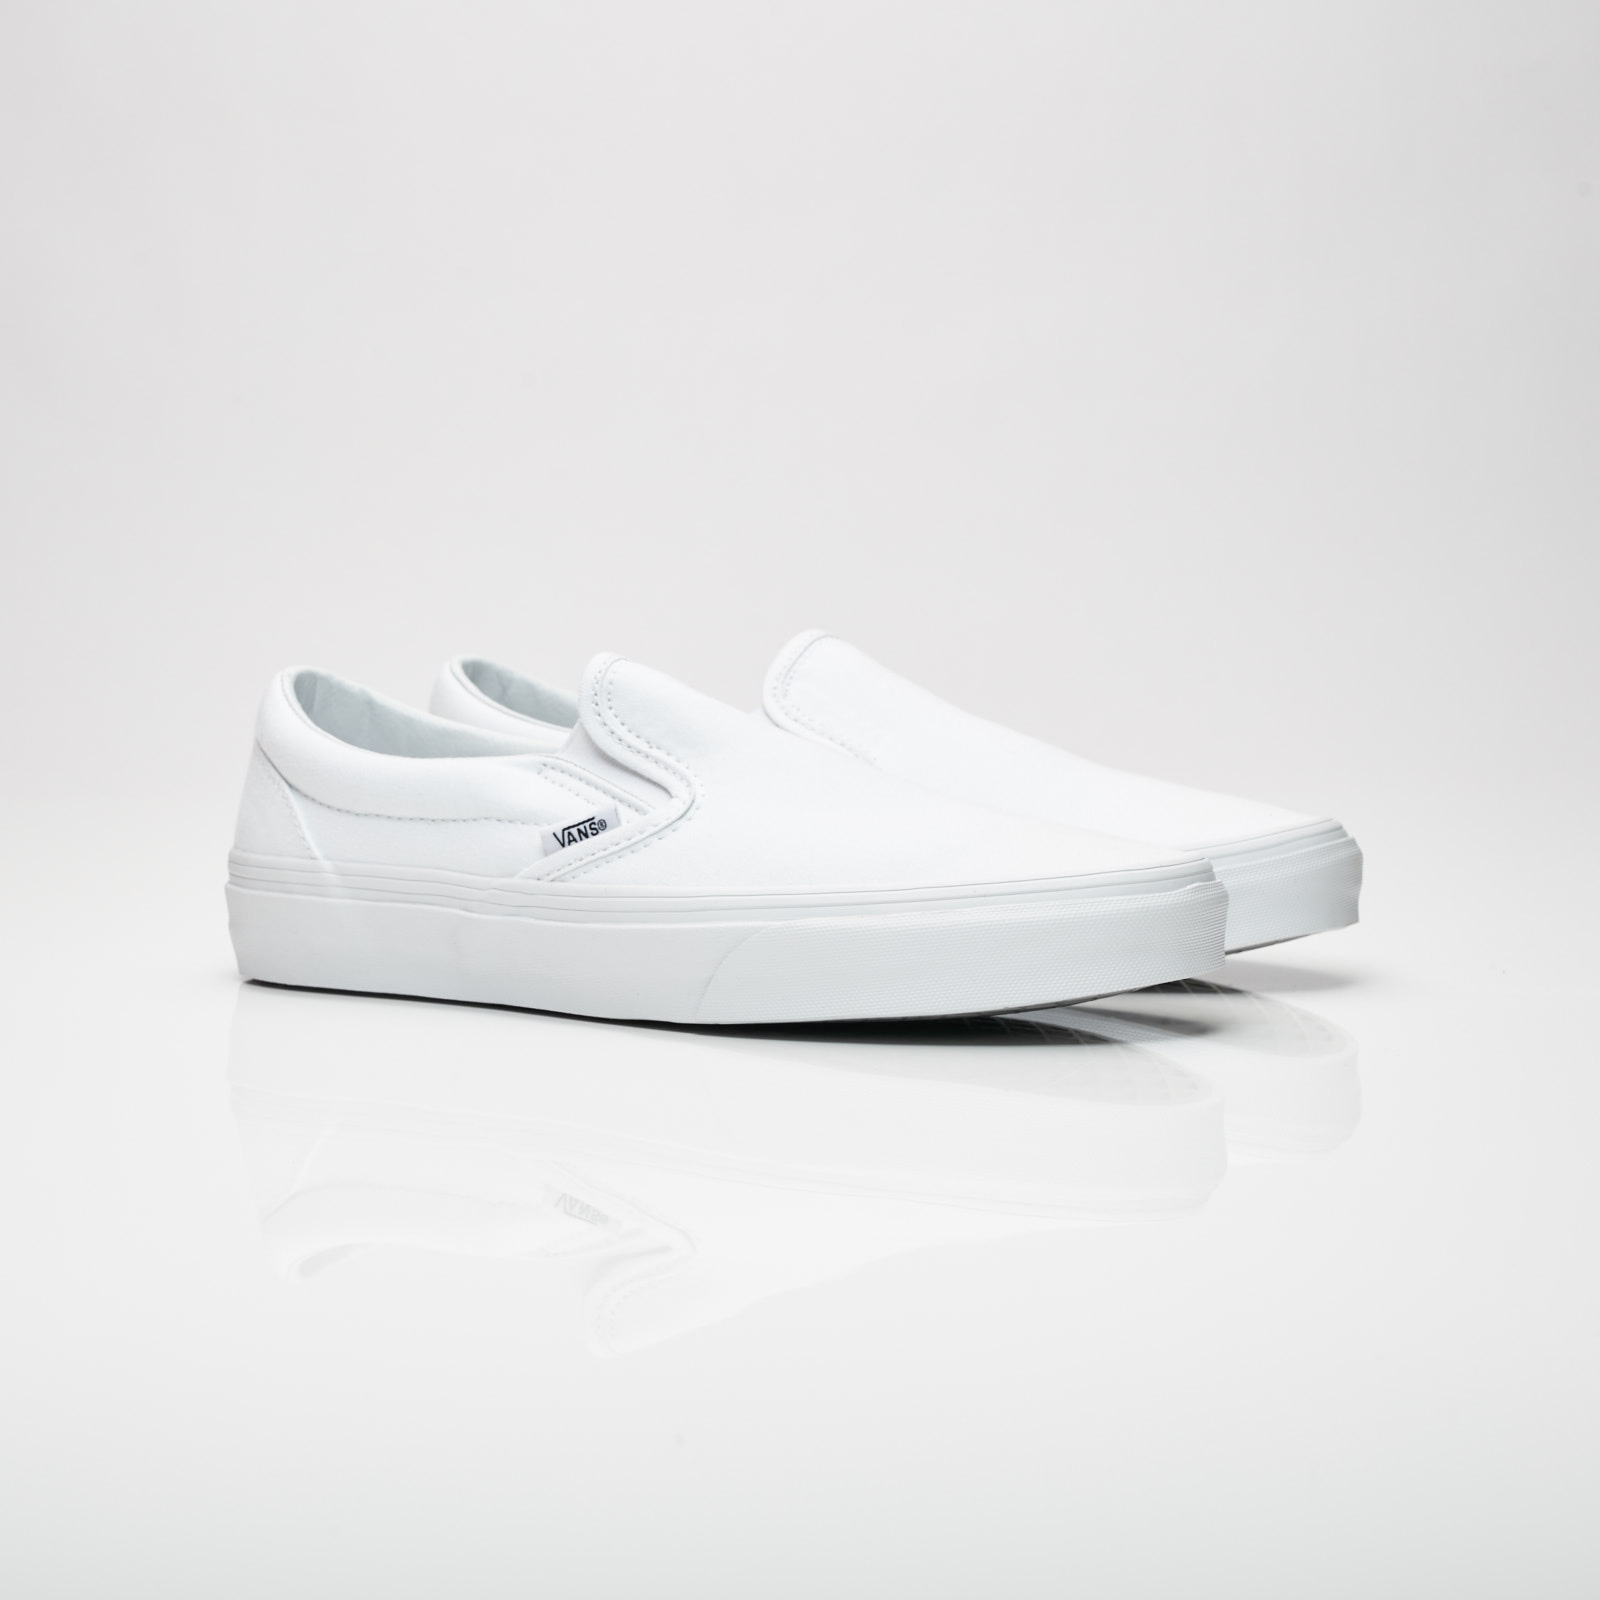 Vans Classic Slip-on(VEYEW00) - True White - 5 VZTW3